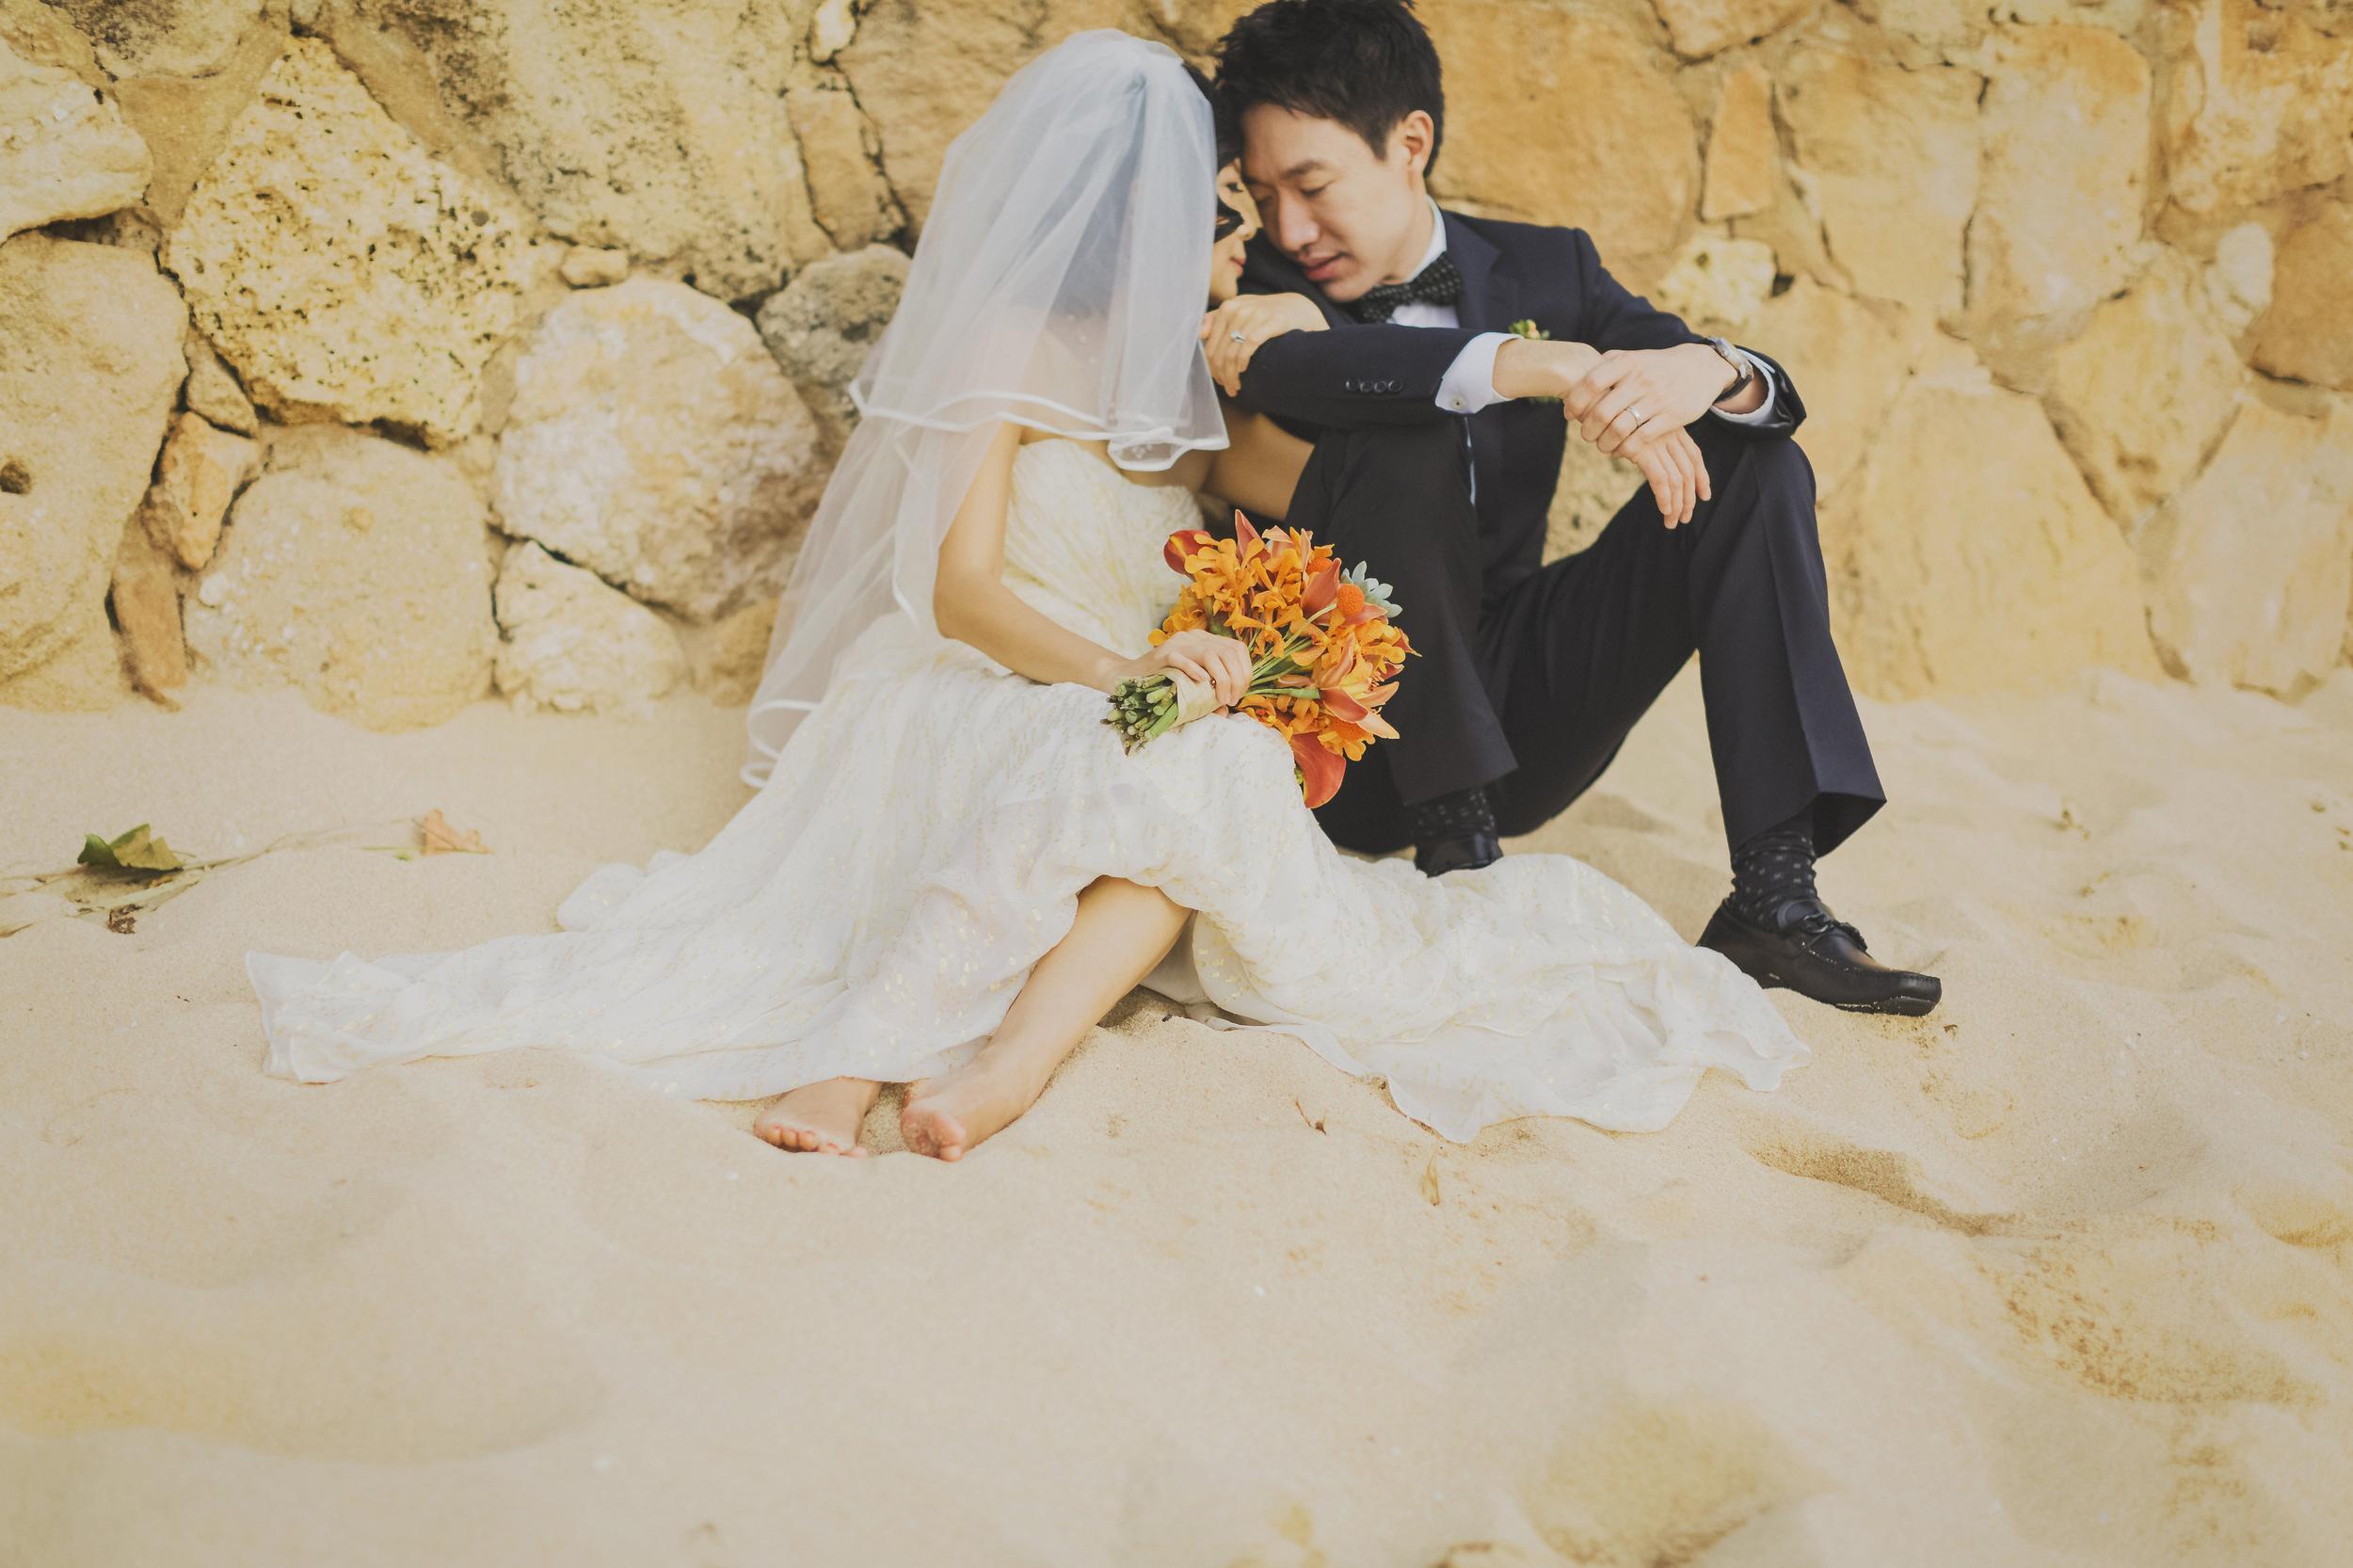 angie-diaz-photography-oahu-wedding-lanikuhonoa-shenshen-marshall-1.jpg